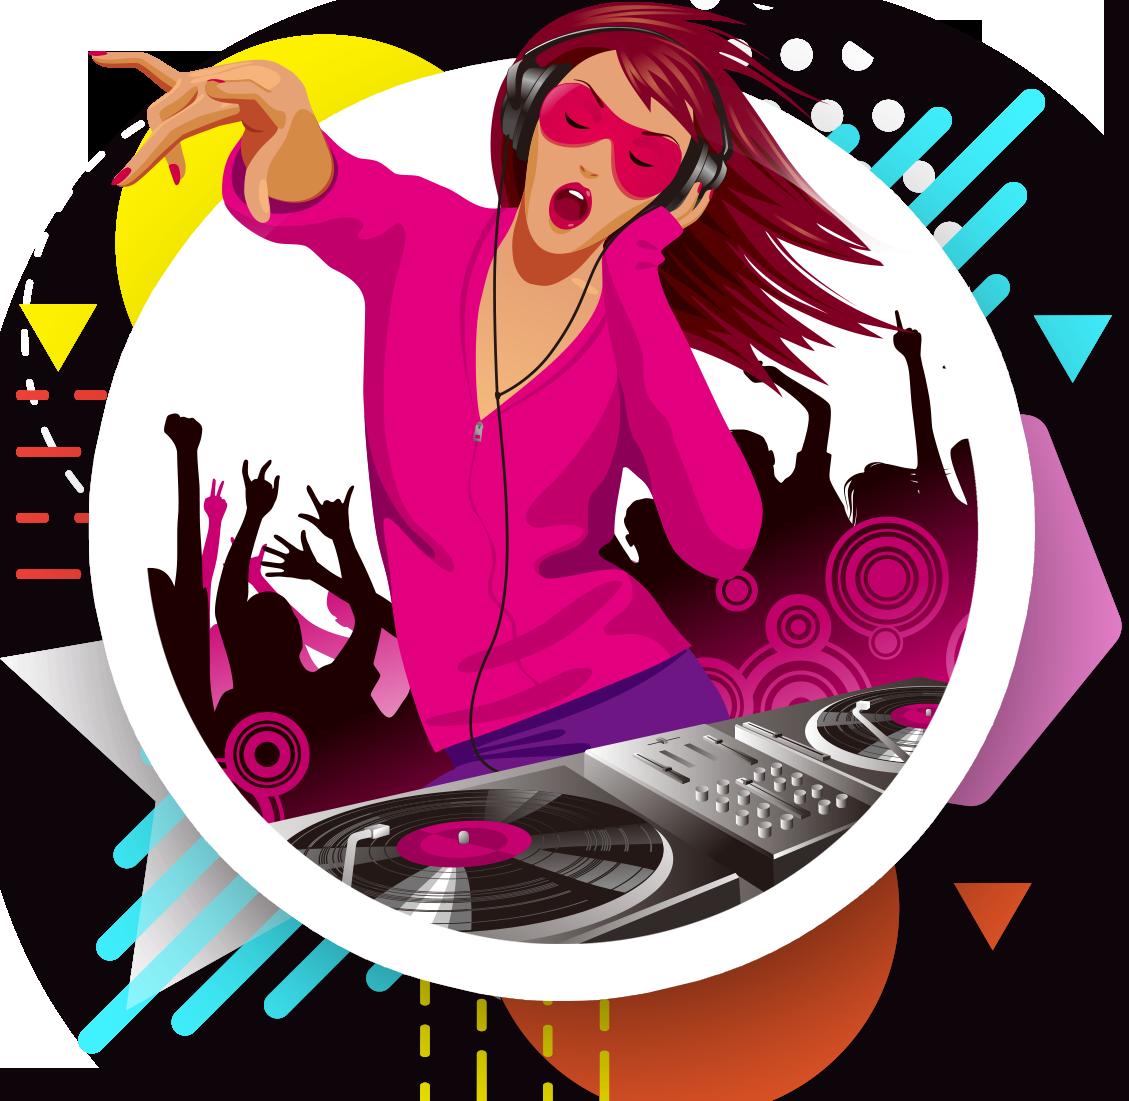 Disc jockey nightclub illustration. Dj clipart girl dj